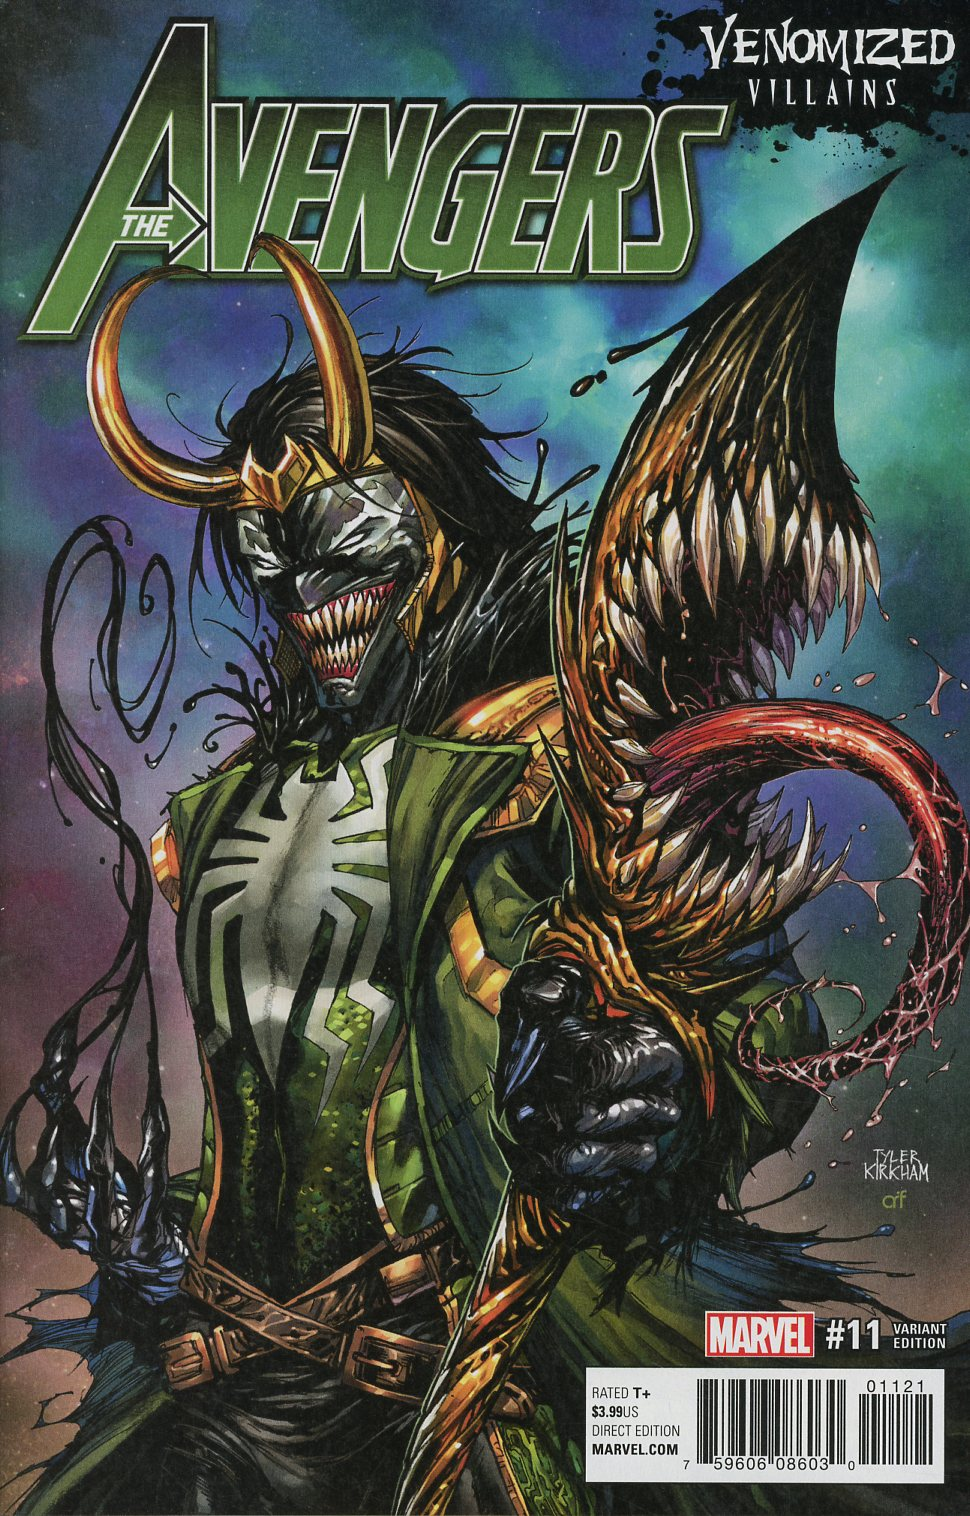 Avengers Vol 6 #11 Cover B Variant Tyler Kirkham Venomized Loki Cover (Secret Empire Epilogue)